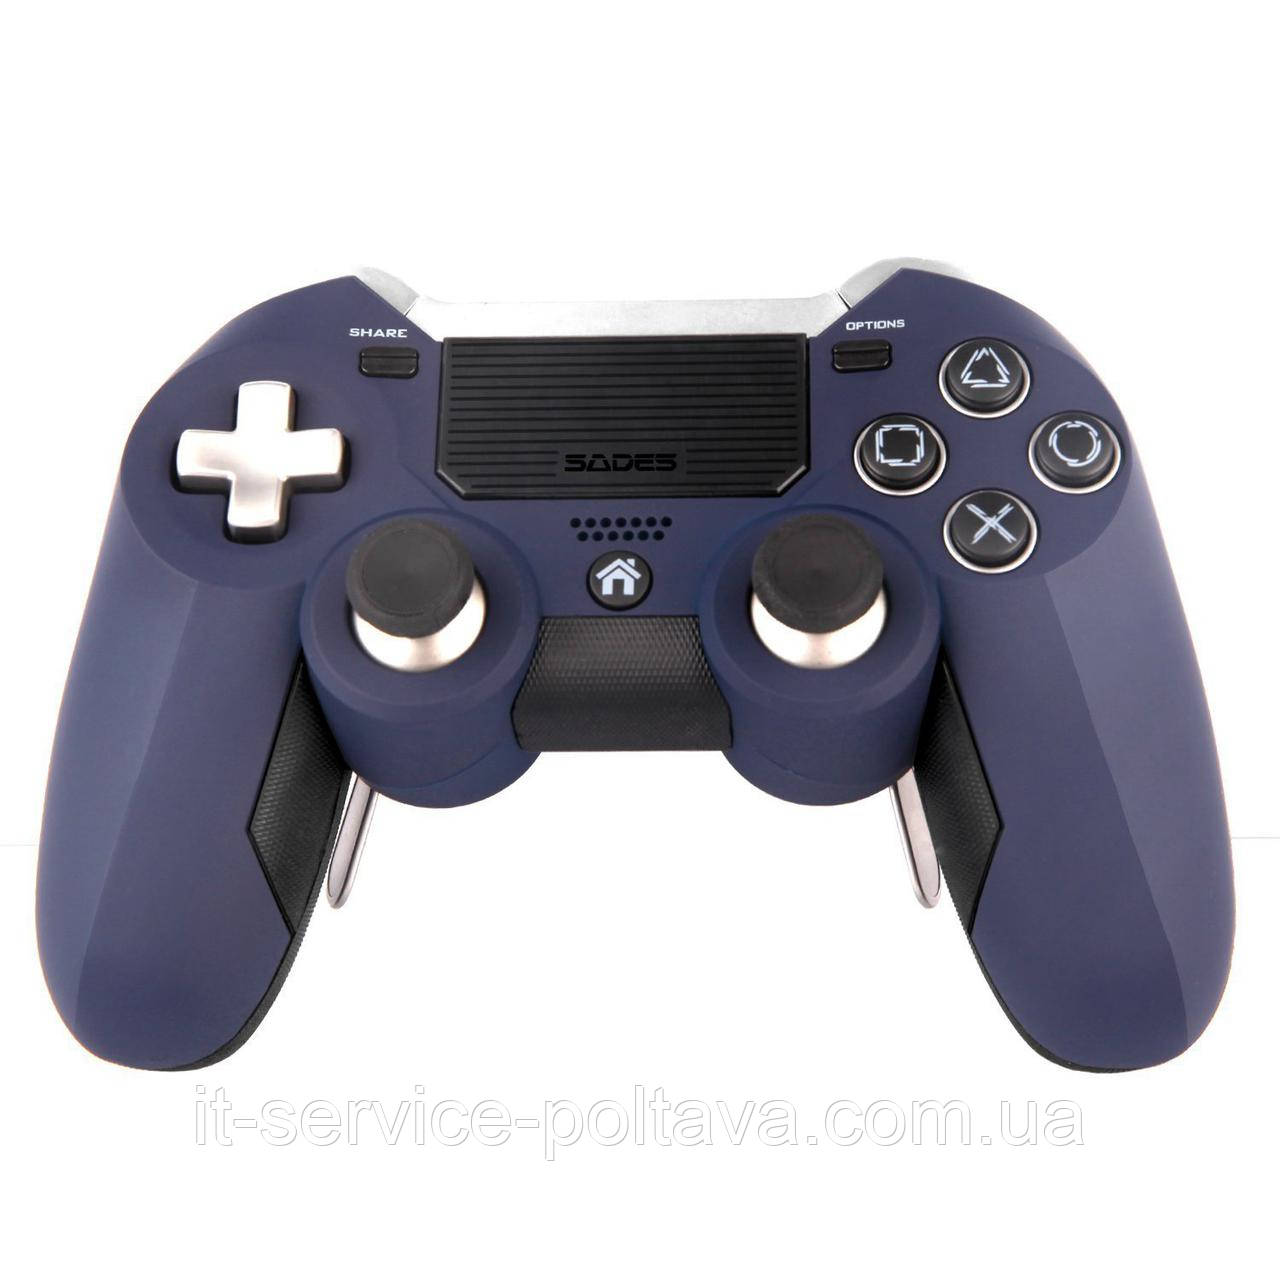 Джойстик Elite Gamepad Remote Control PS4 Game